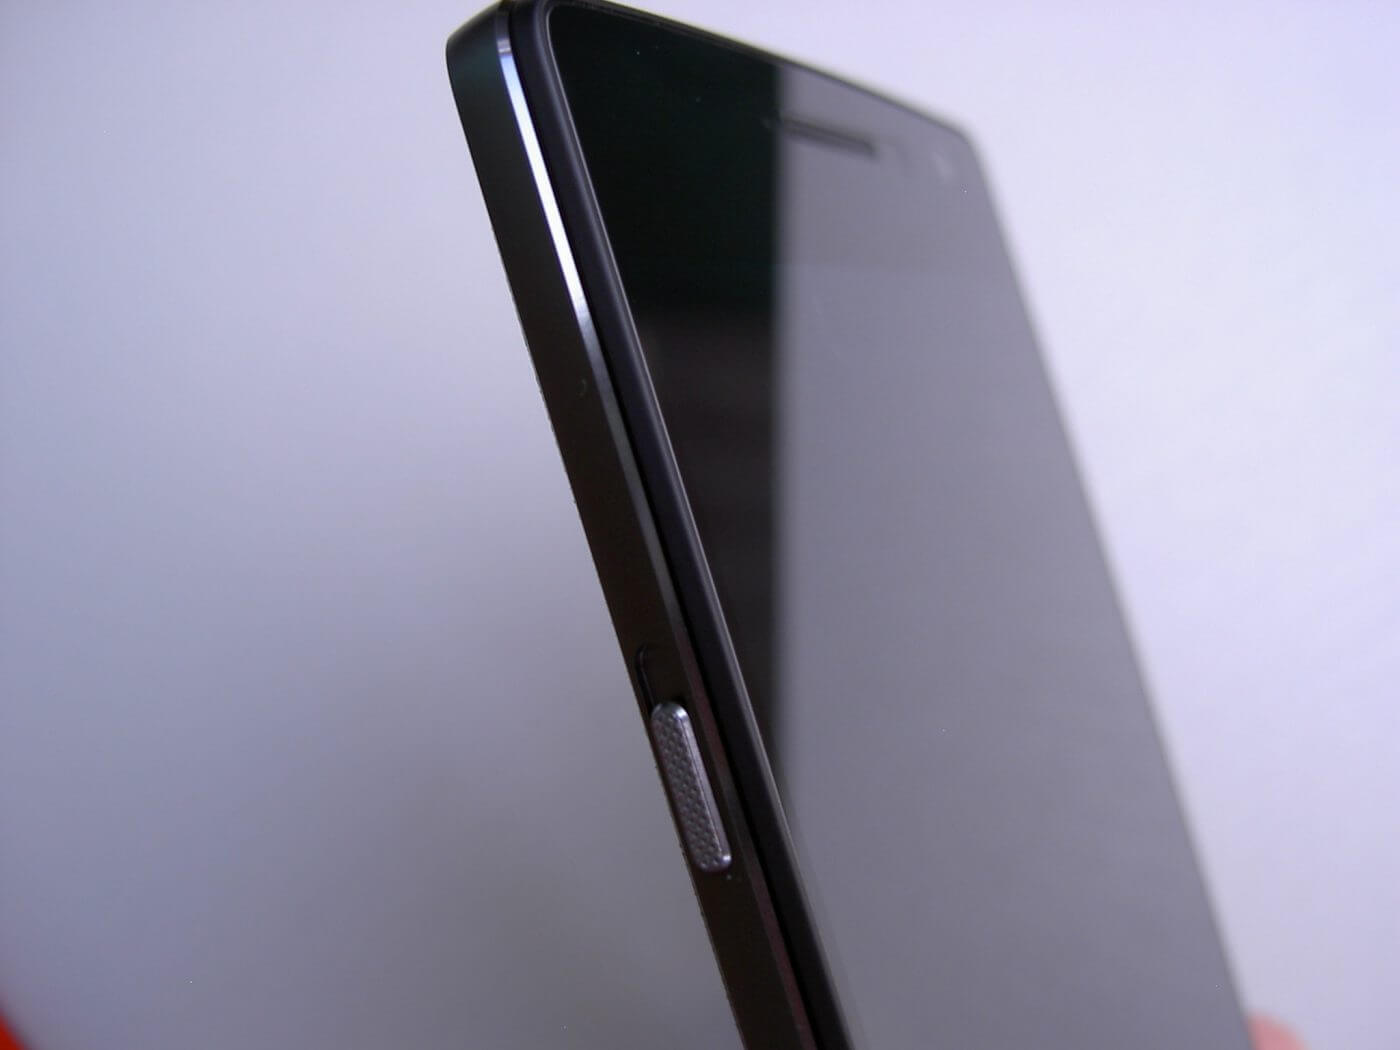 OnePlus 2 side